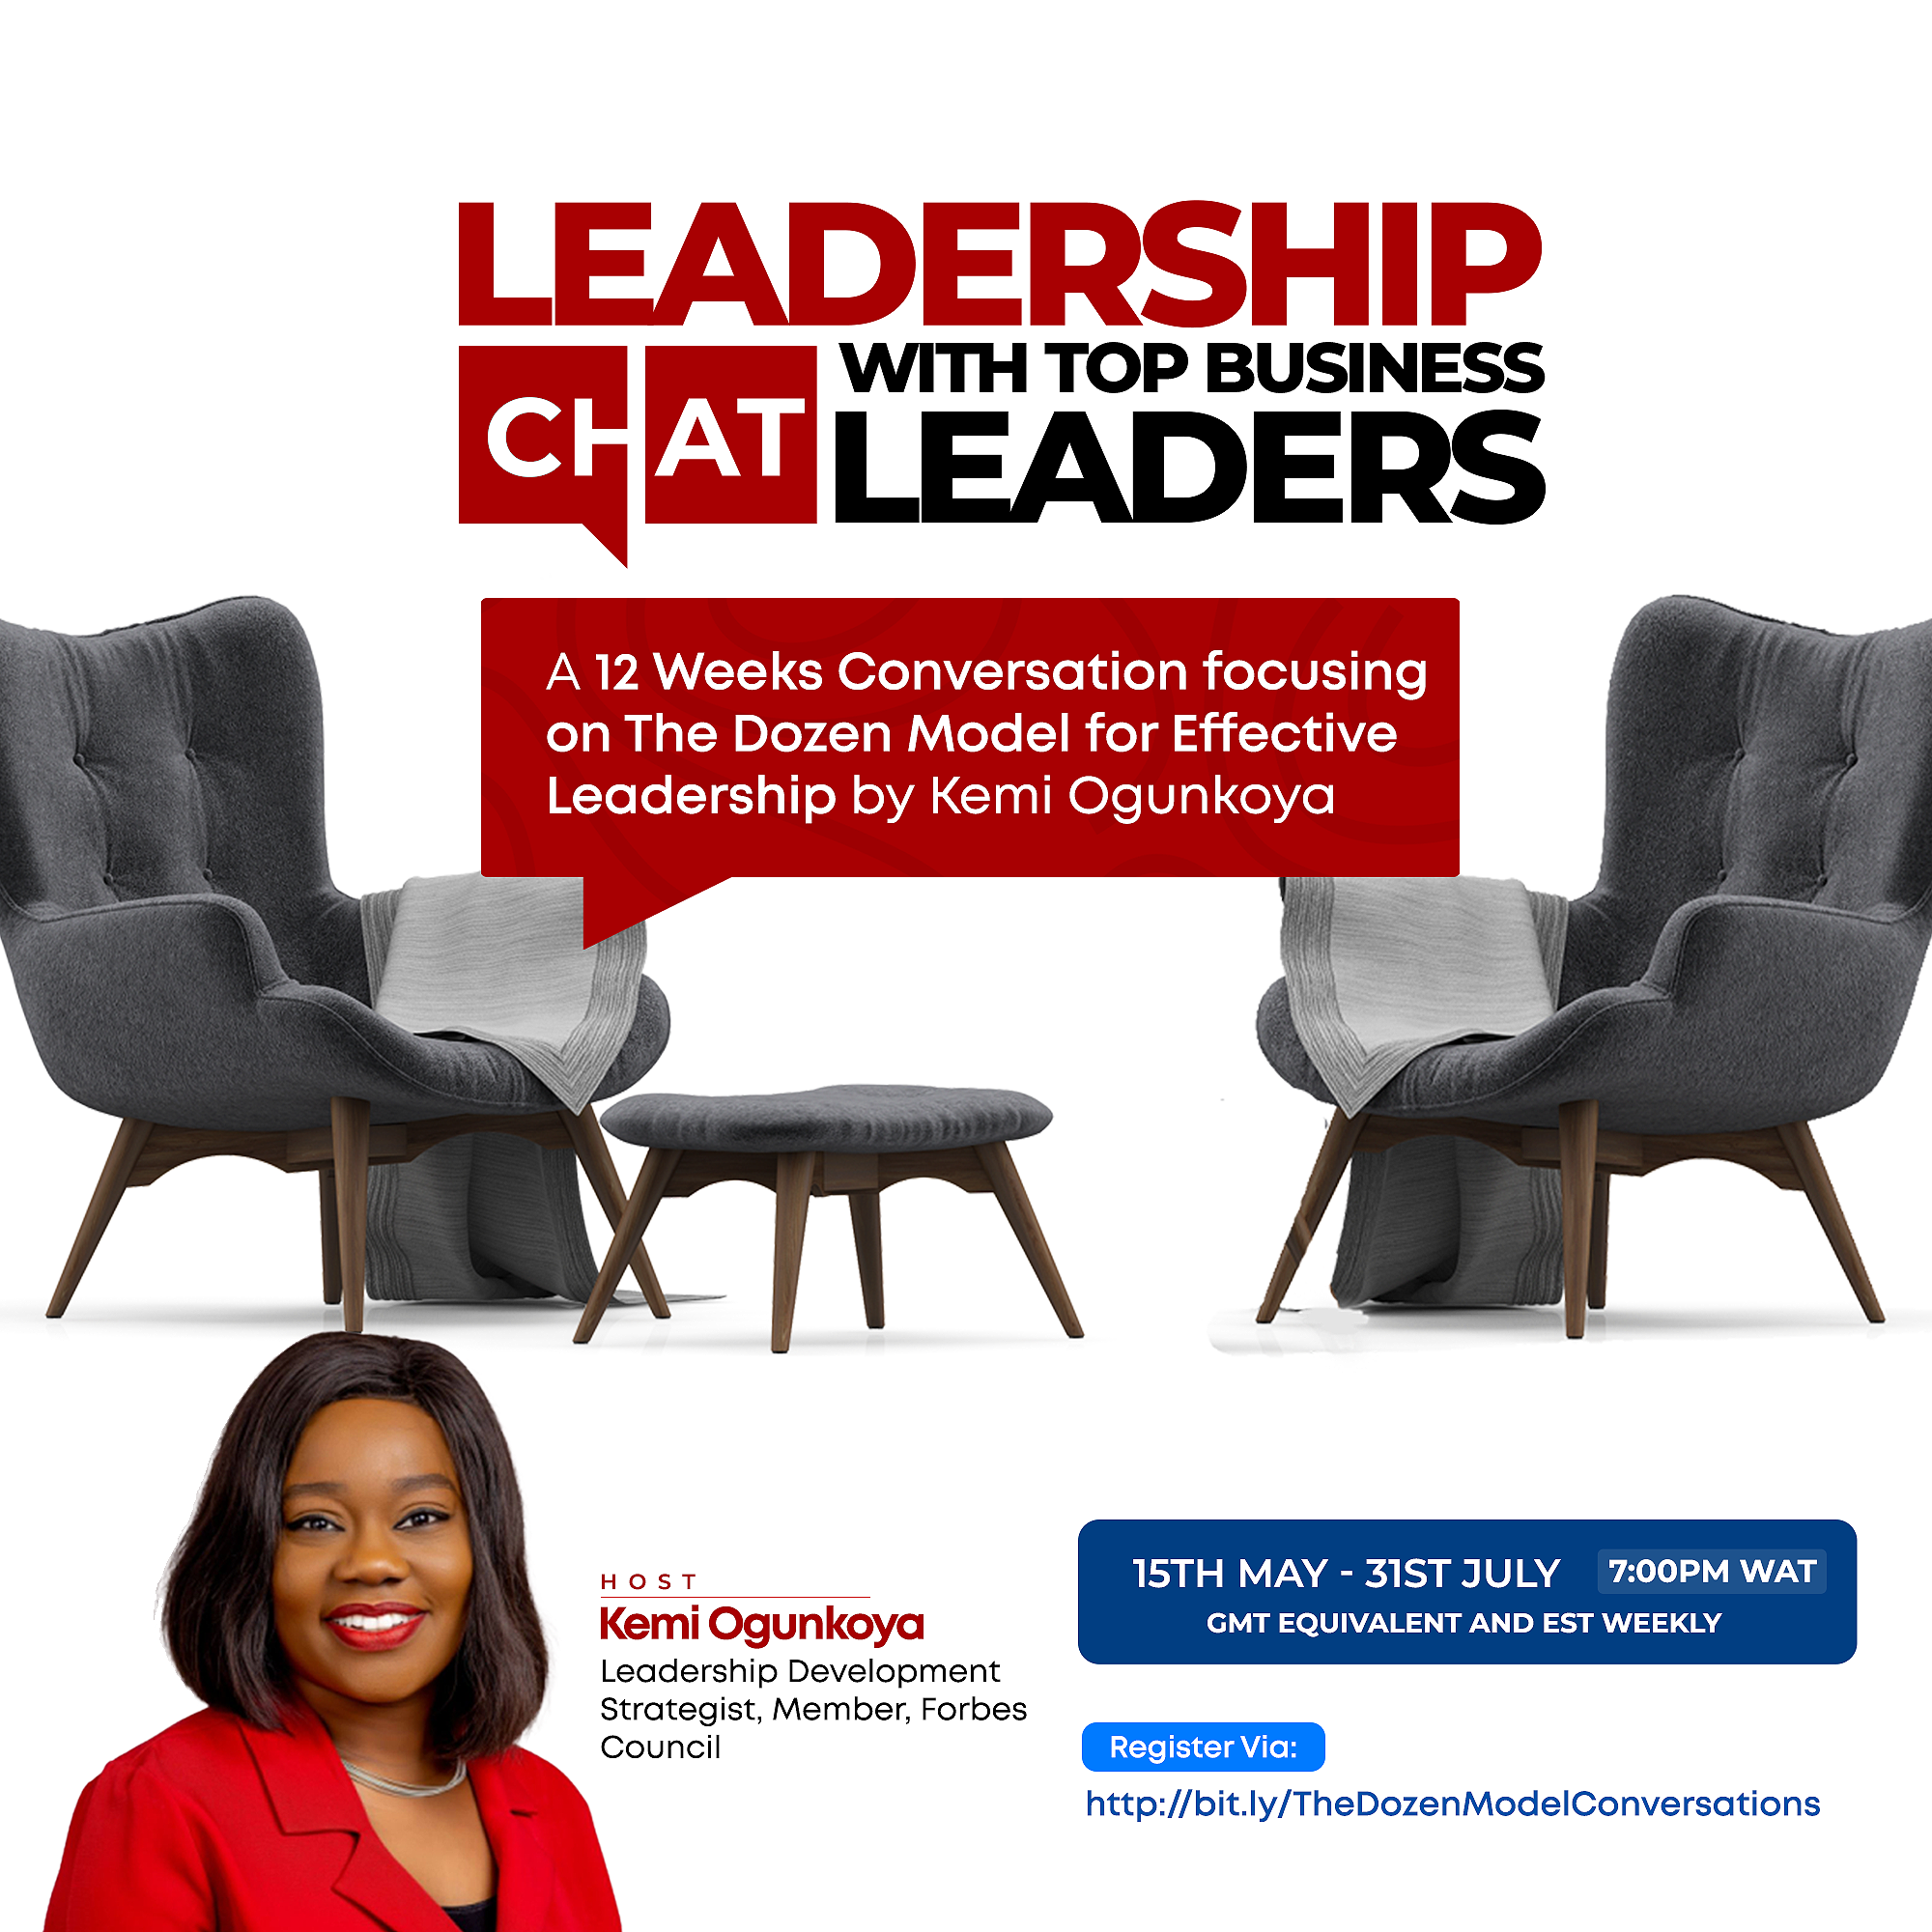 leadership chat